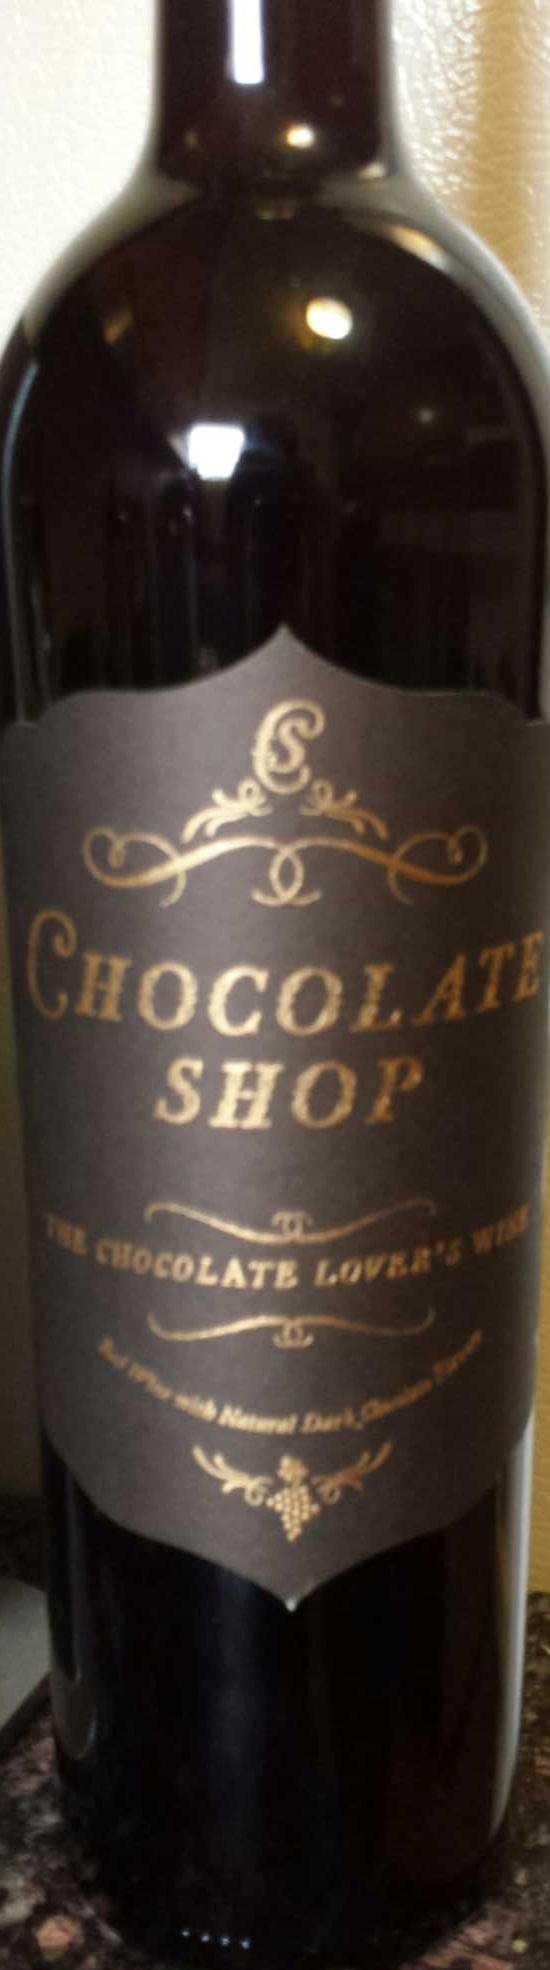 Chocolate shop wine - 750 ml